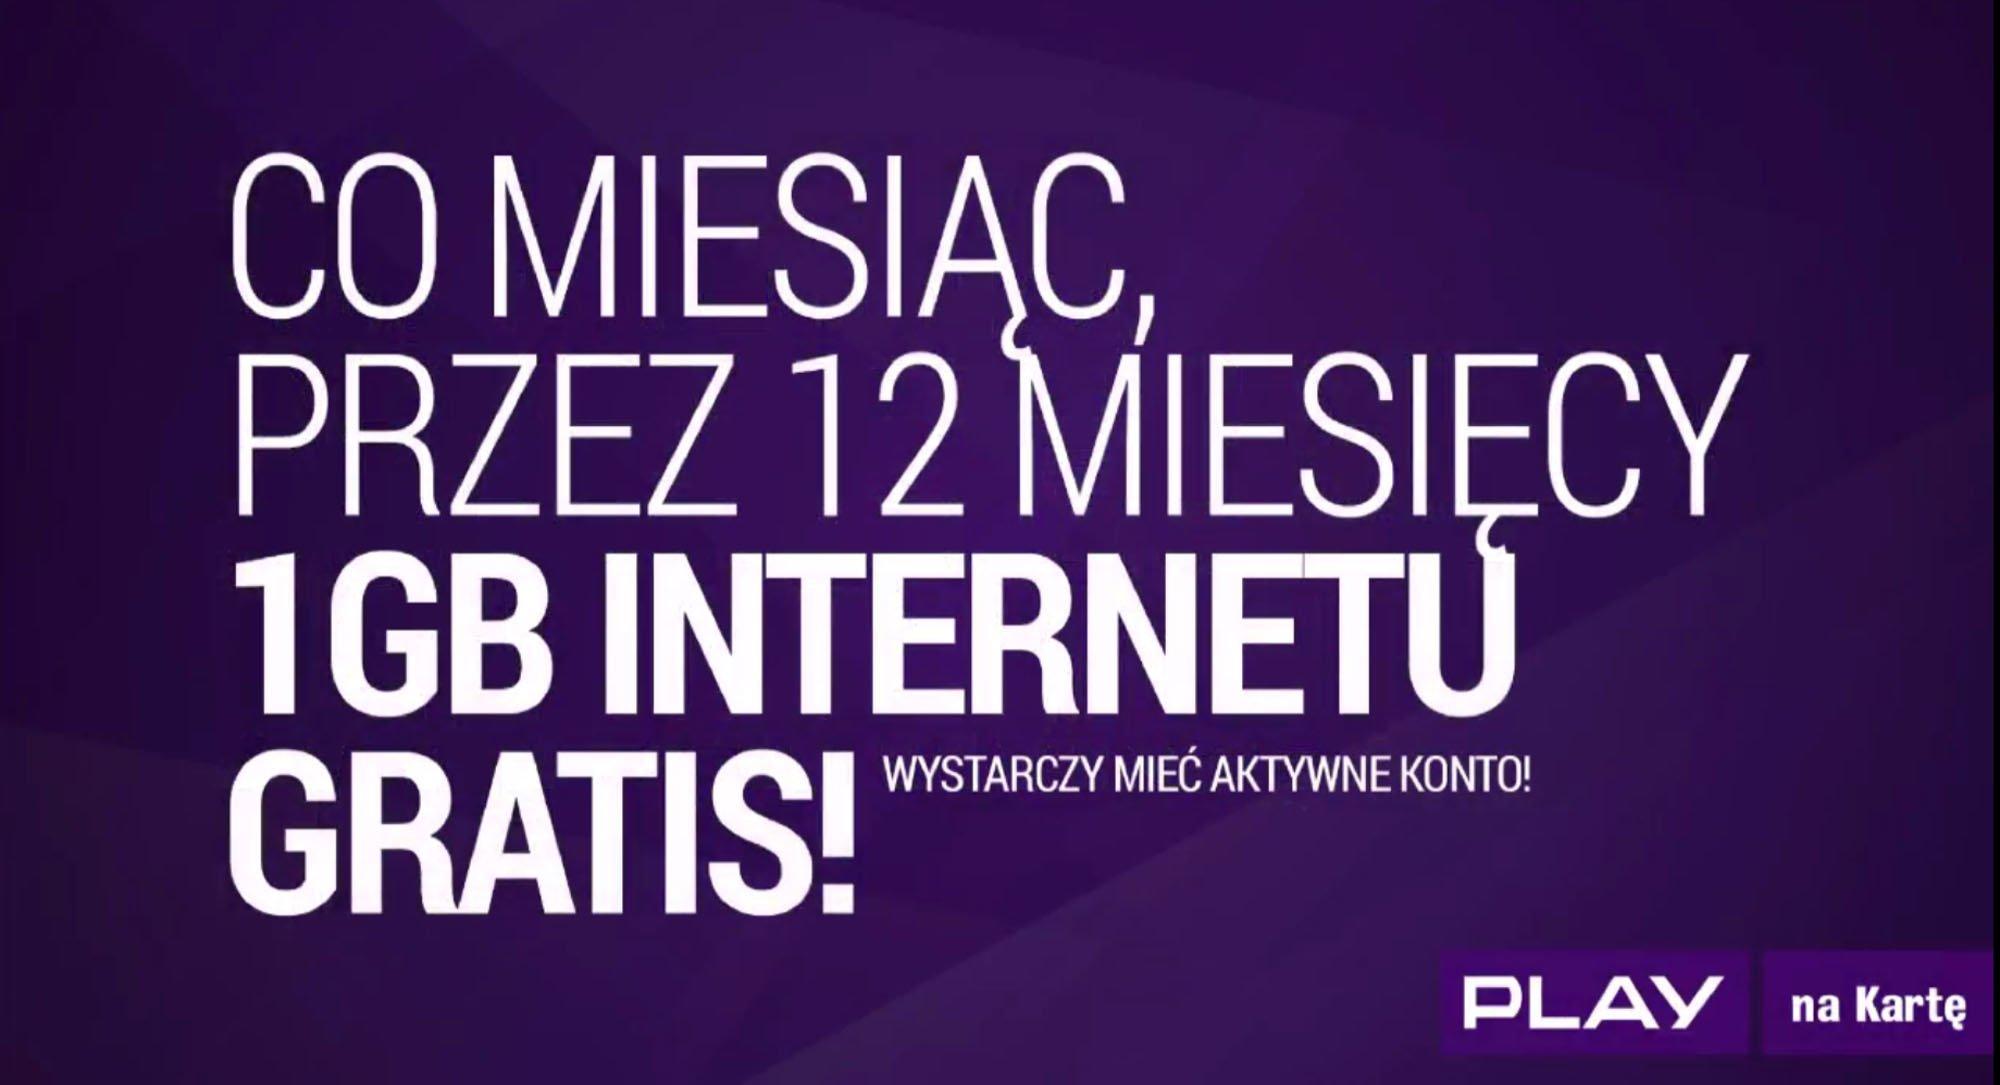 Play na kartę Rok Internetu za darmo 2